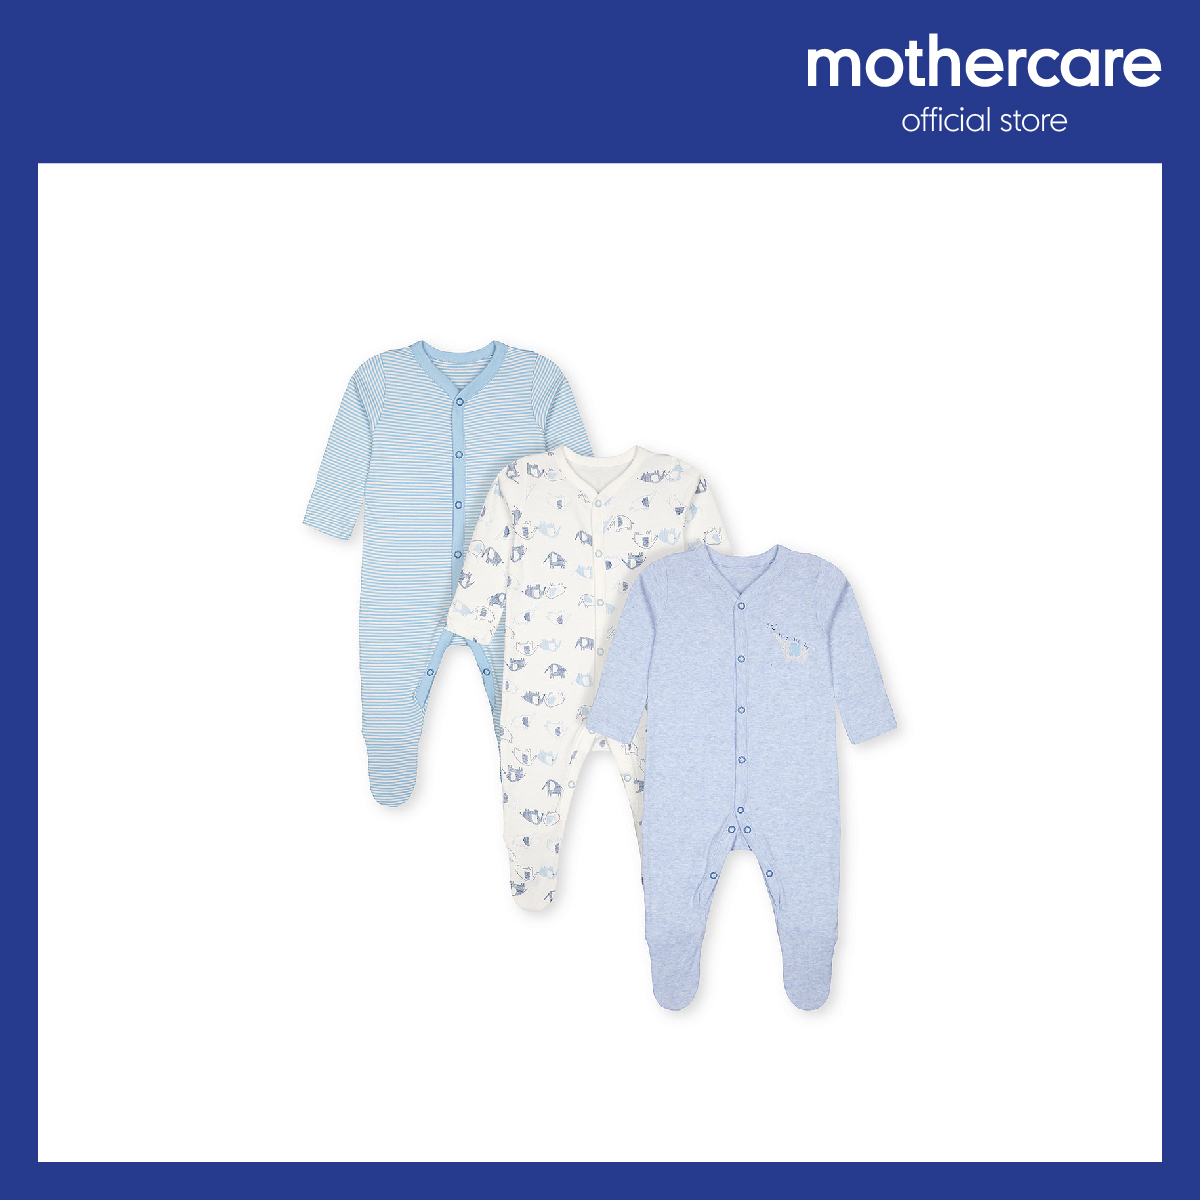 Baby Play suit Spit Happens Funny Baby Vest Bodysuit Sleep Suit